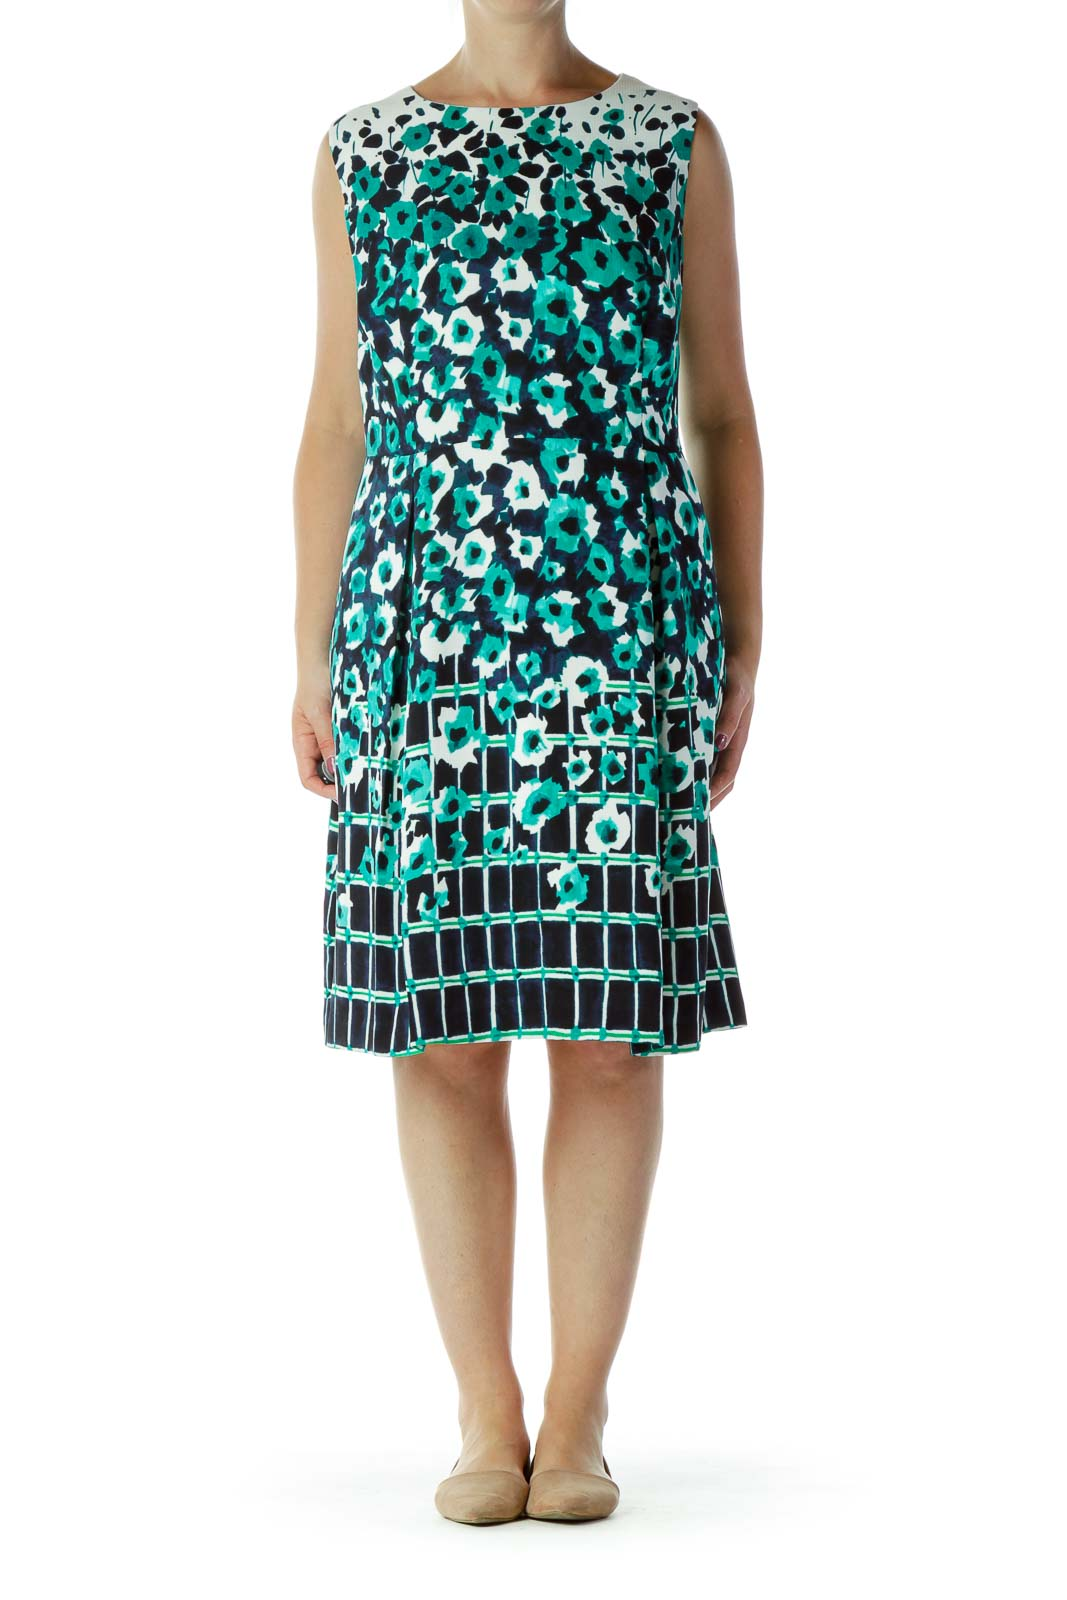 Green Blue White Flower Checkered A-Line Dress